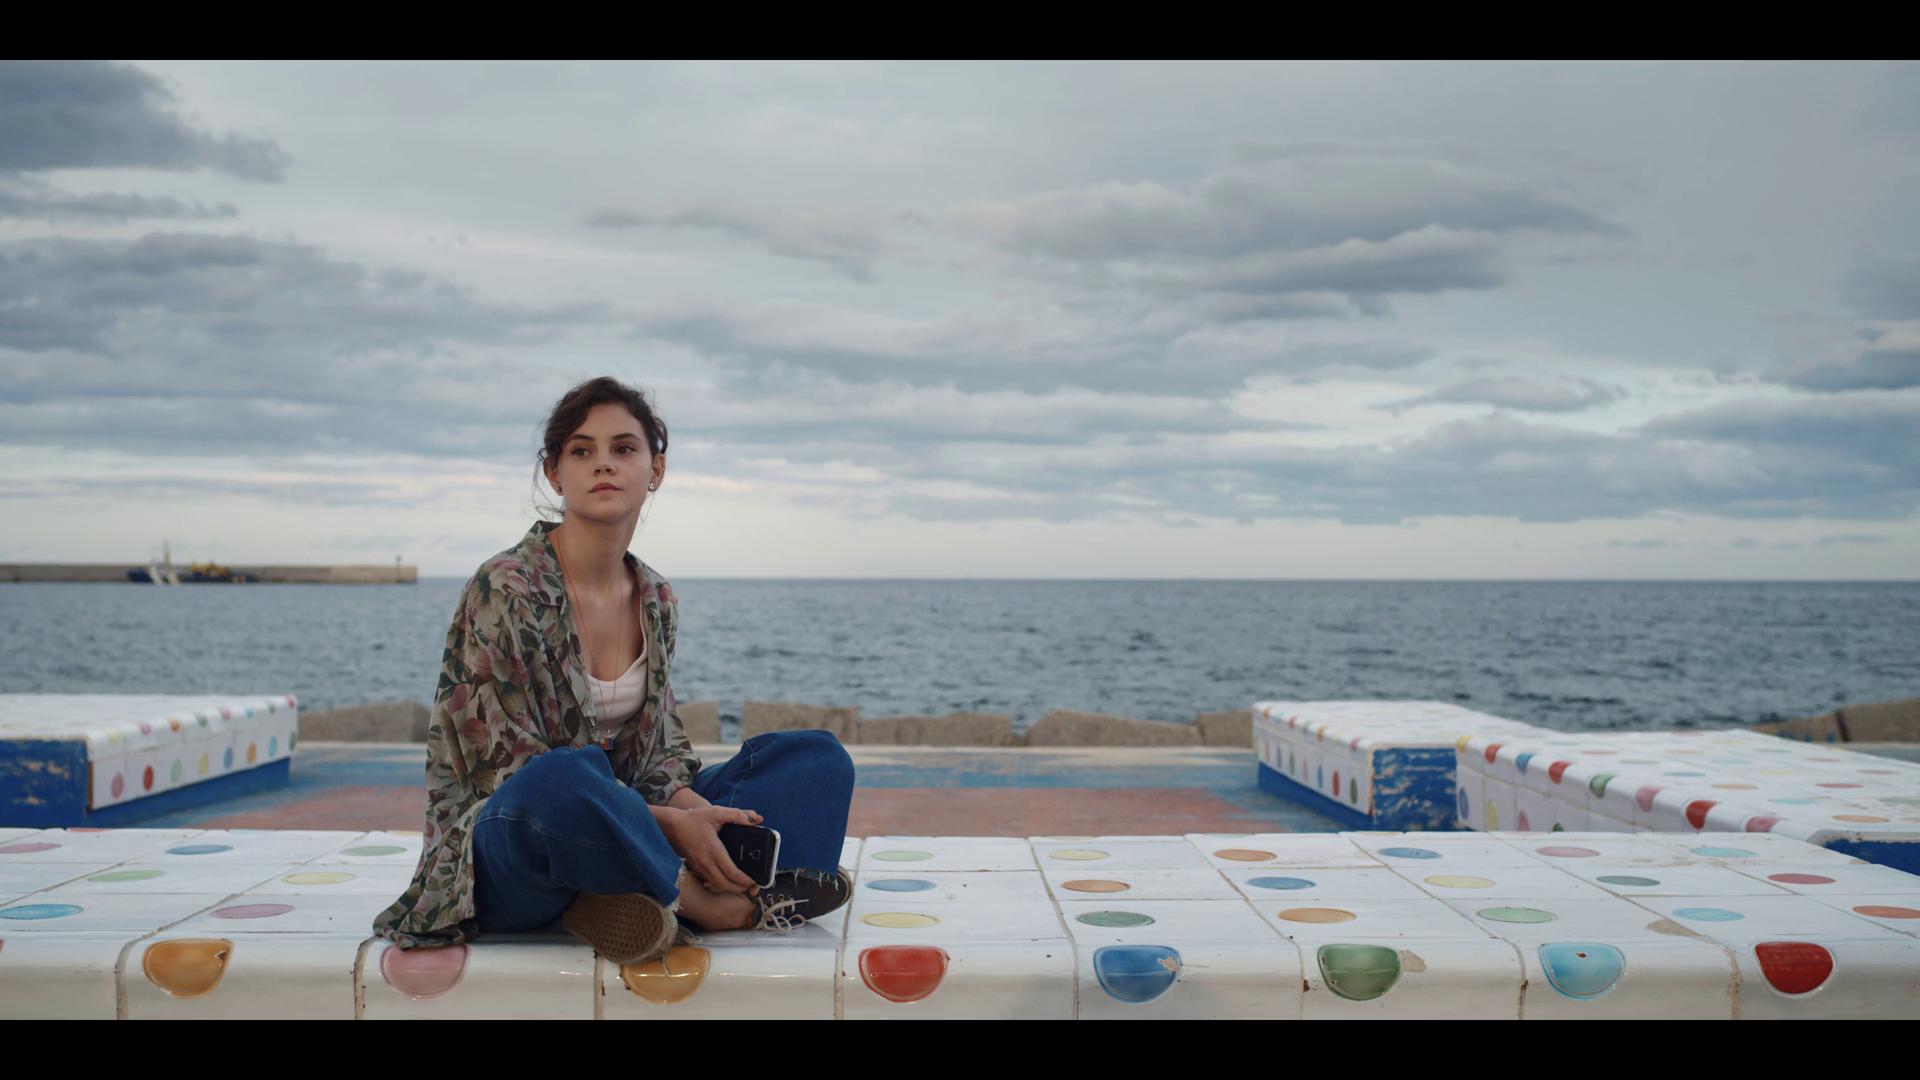 En la misma ola (2021) 1080p WEB-DL Latino